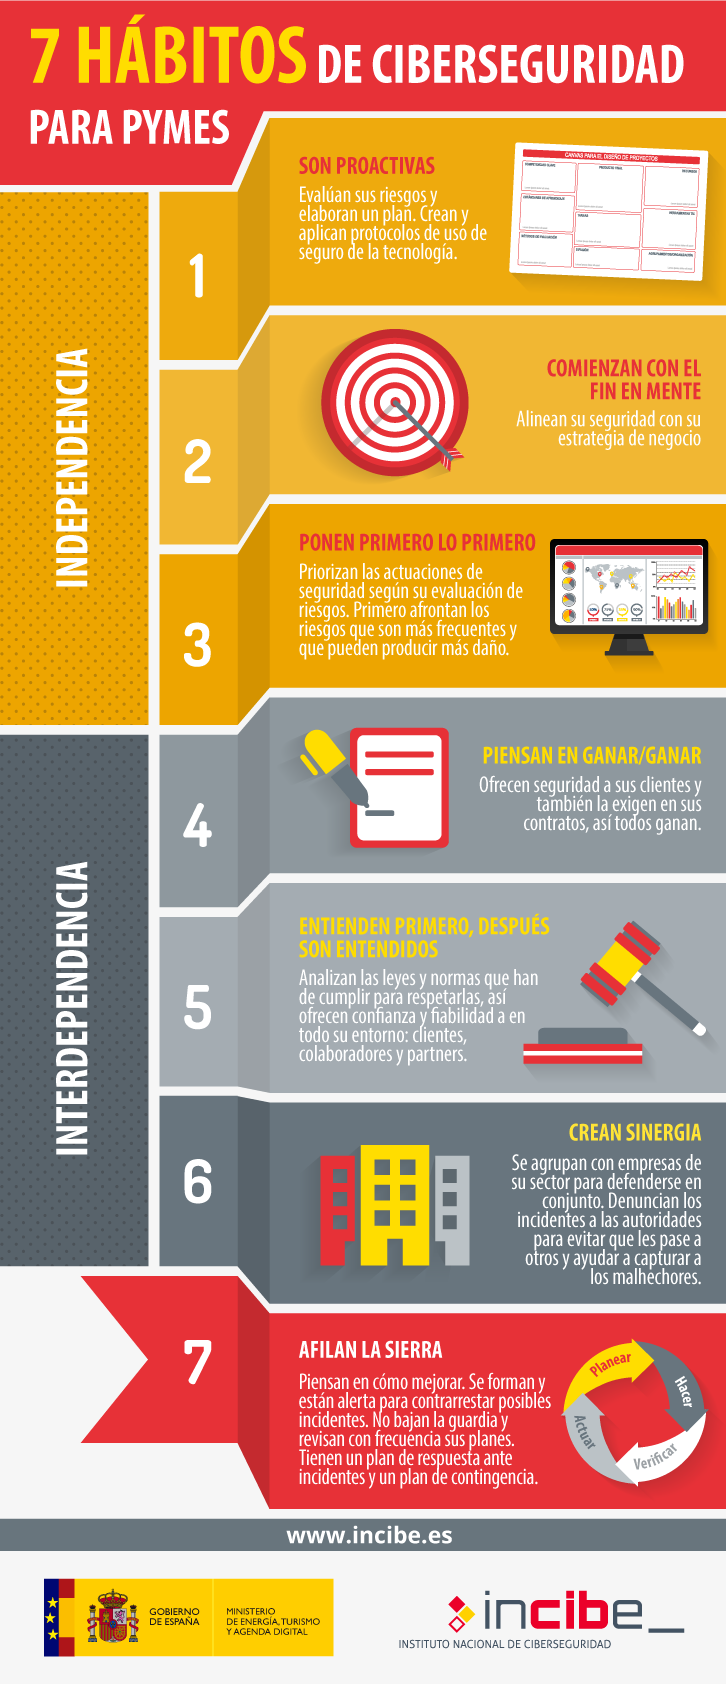 7 hábitos de ciberseguridad para pymes (infografía)